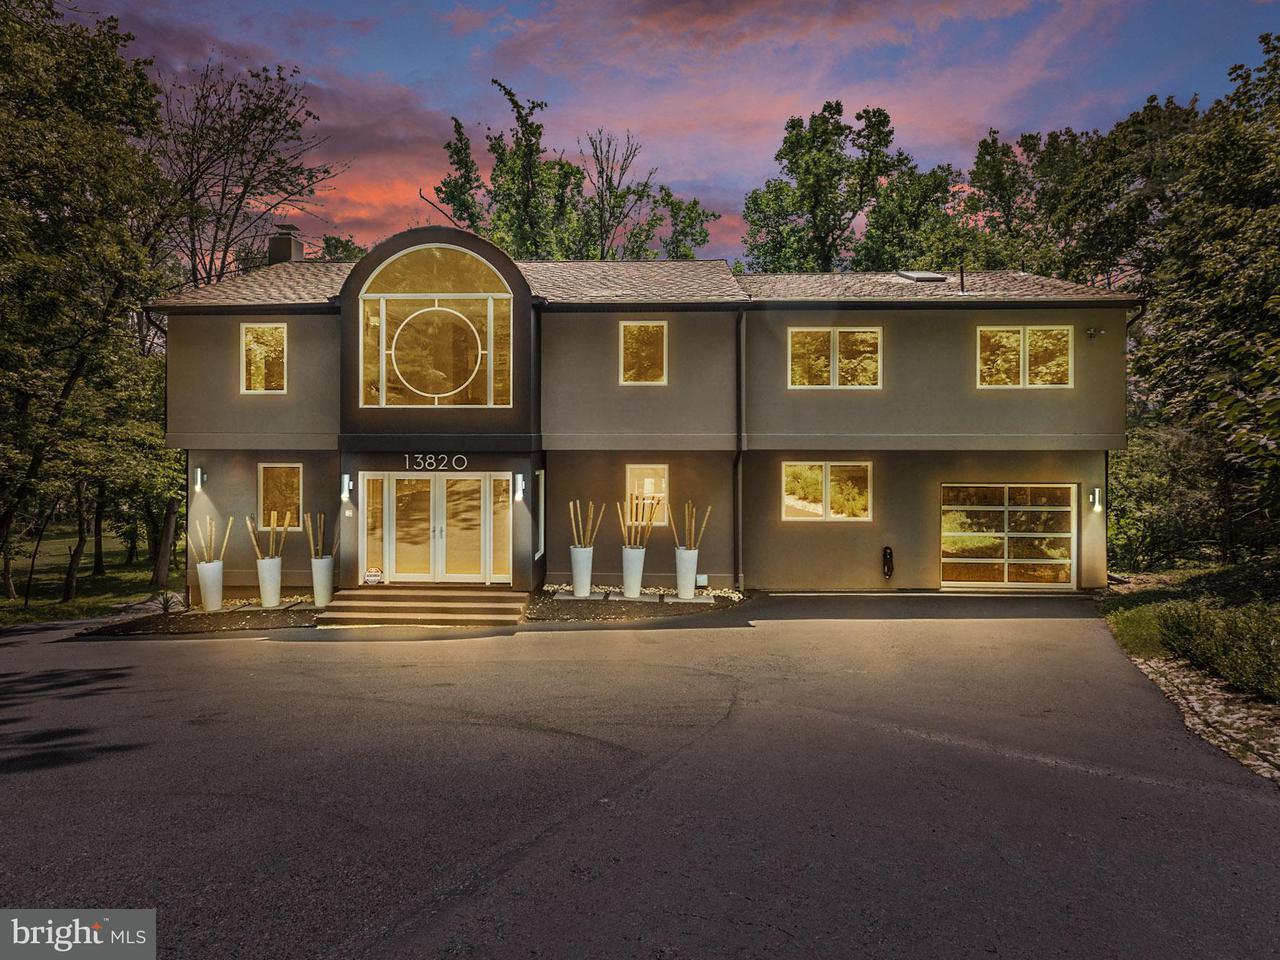 独户住宅 为 销售 在 13820 Piscataway Drive 13820 Piscataway Drive Fort Washington, 马里兰州 20744 美国